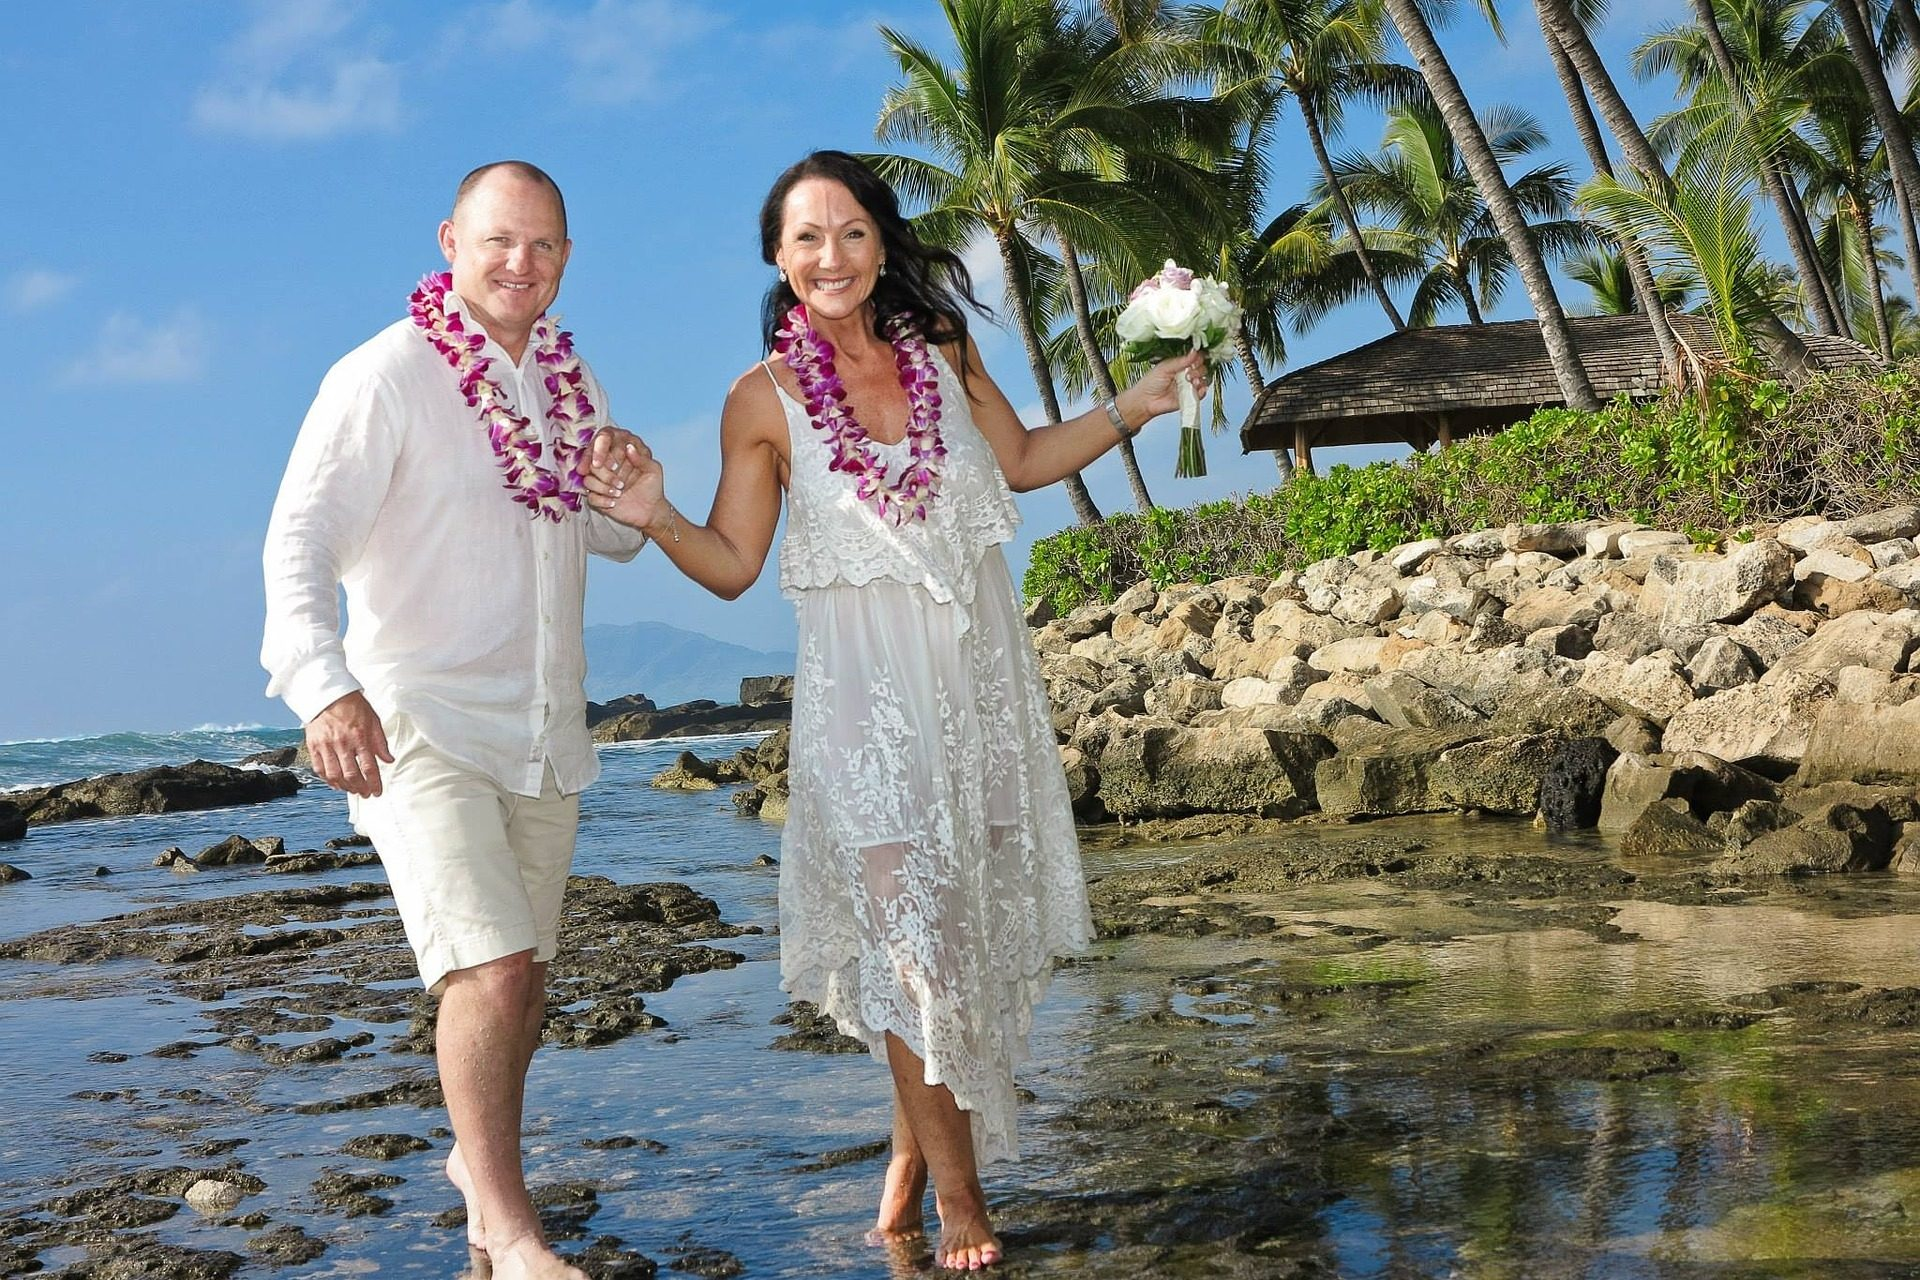 awaii Wedding Packages